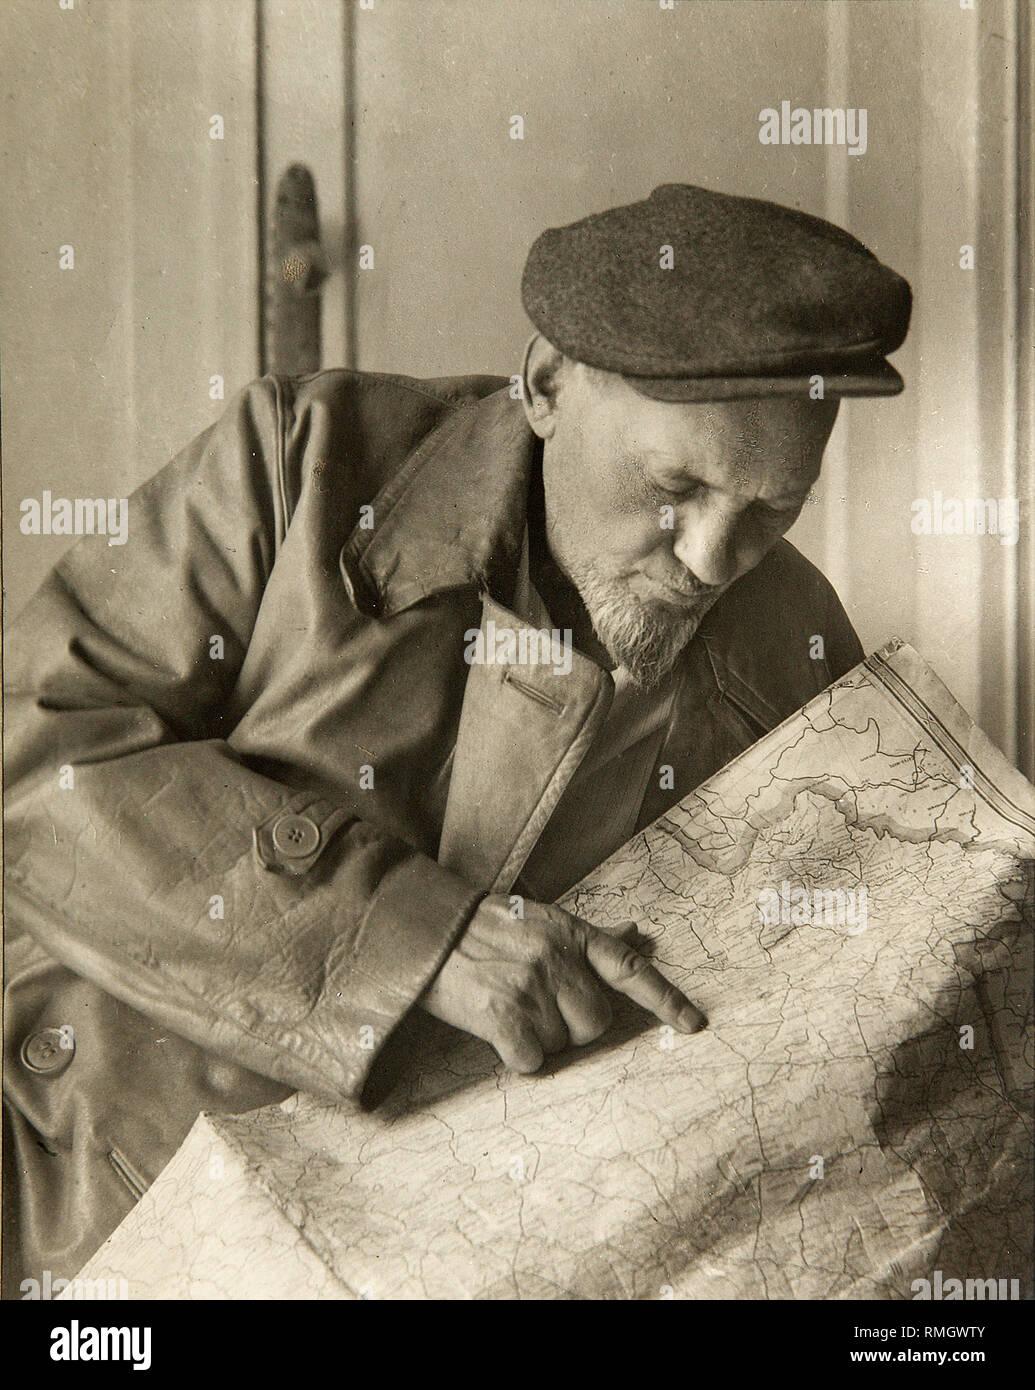 Ukrainian partisan leader during Great Patriotic War Sidor Kovpak. Photograph - Stock Image